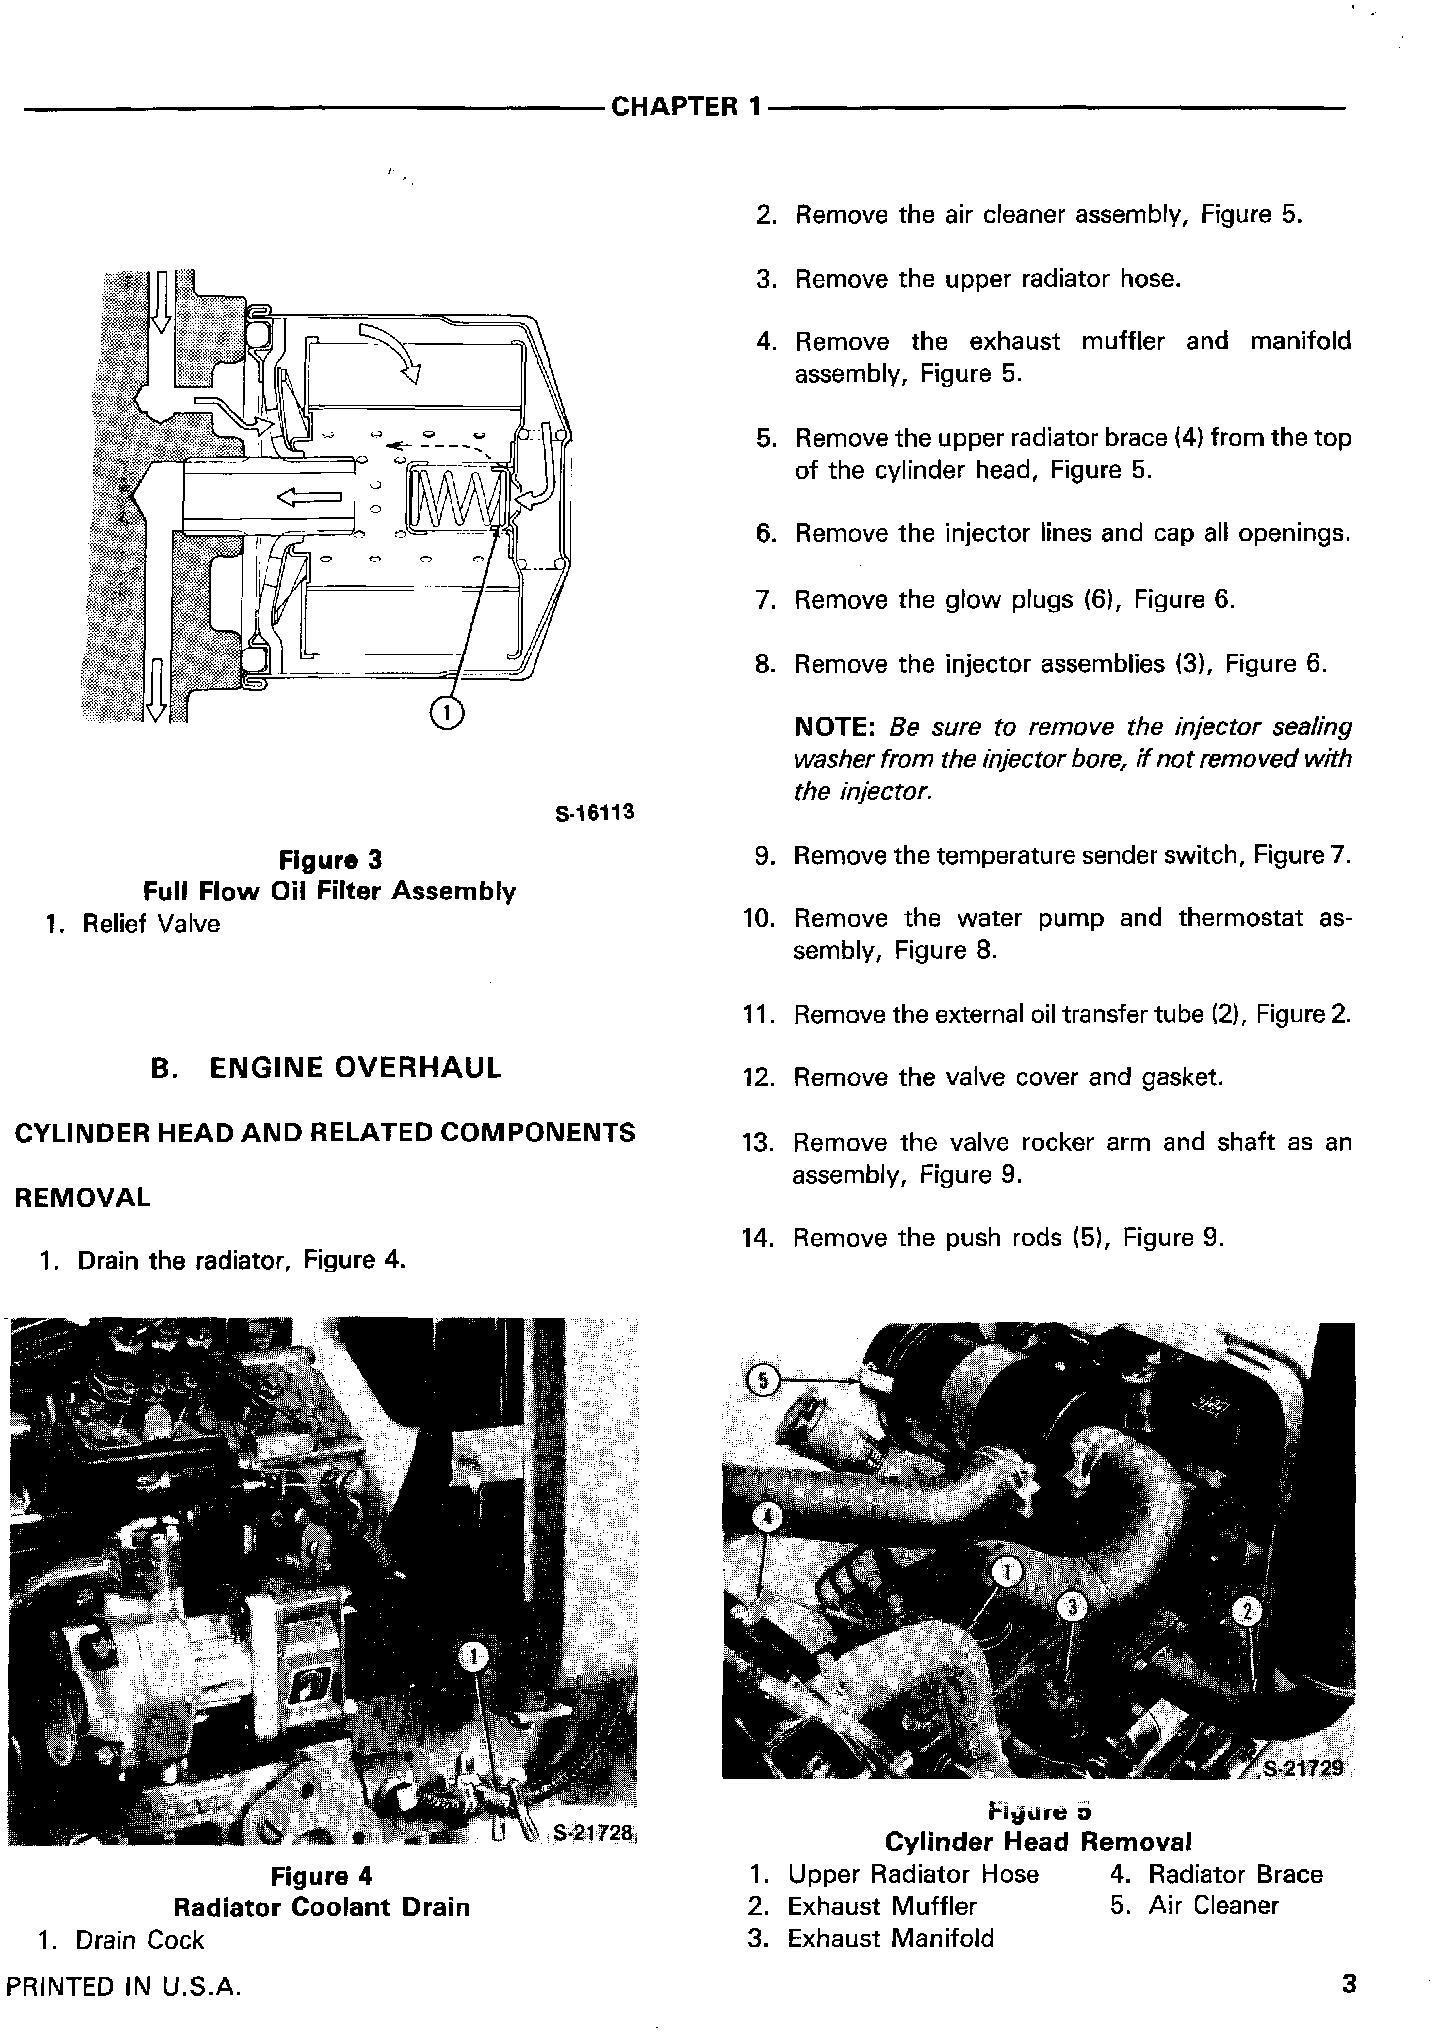 Ford 1120, 1220, 1215 Tractors Service Manual (SE4601) - 1